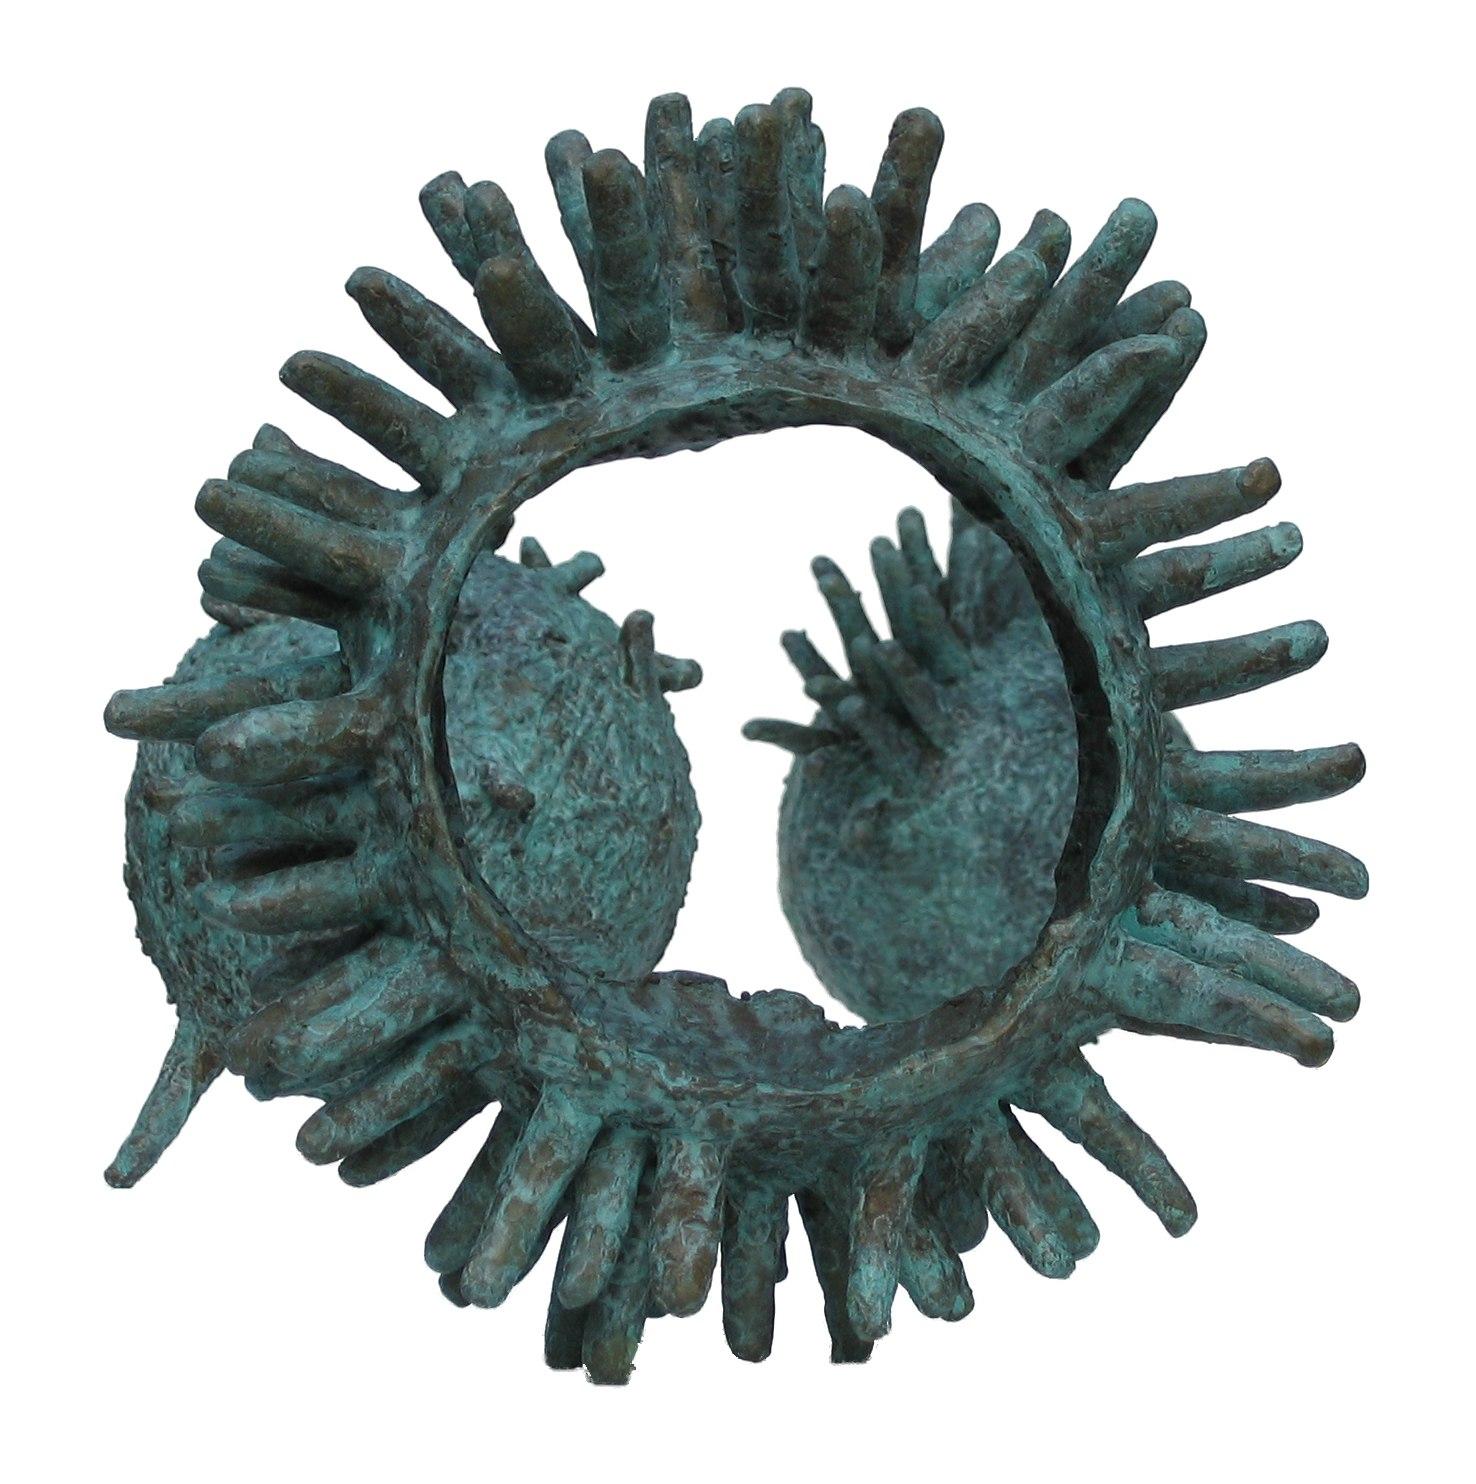 Microcosmos, Series of 3 sculptures in Bronze, Cast based on artist's fingers, 2007, each 15 in. in diameter